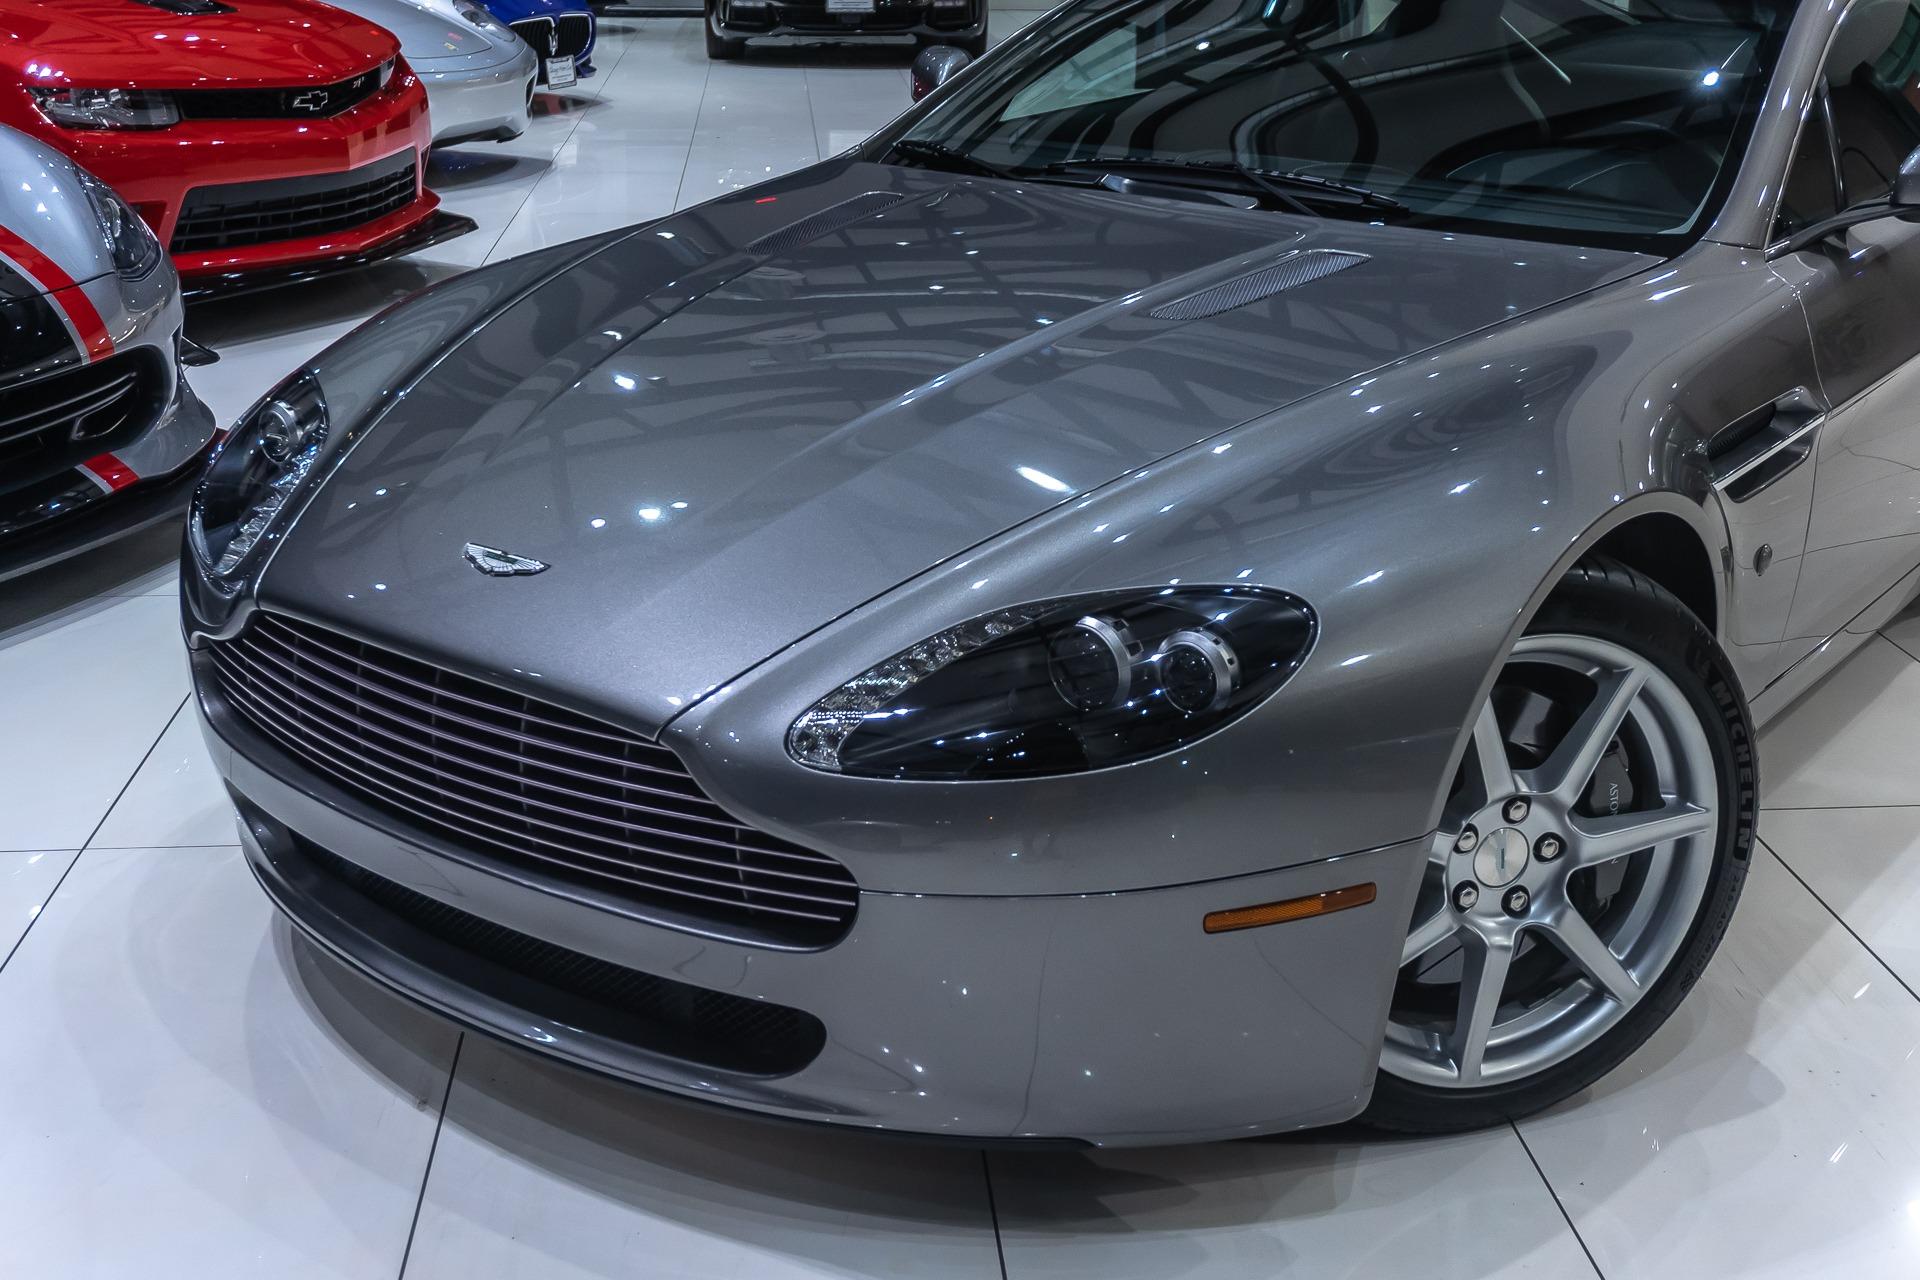 Used-2006-Aston-Martin-Vantage-V8-Coupe-6-SPEED-MANUAL